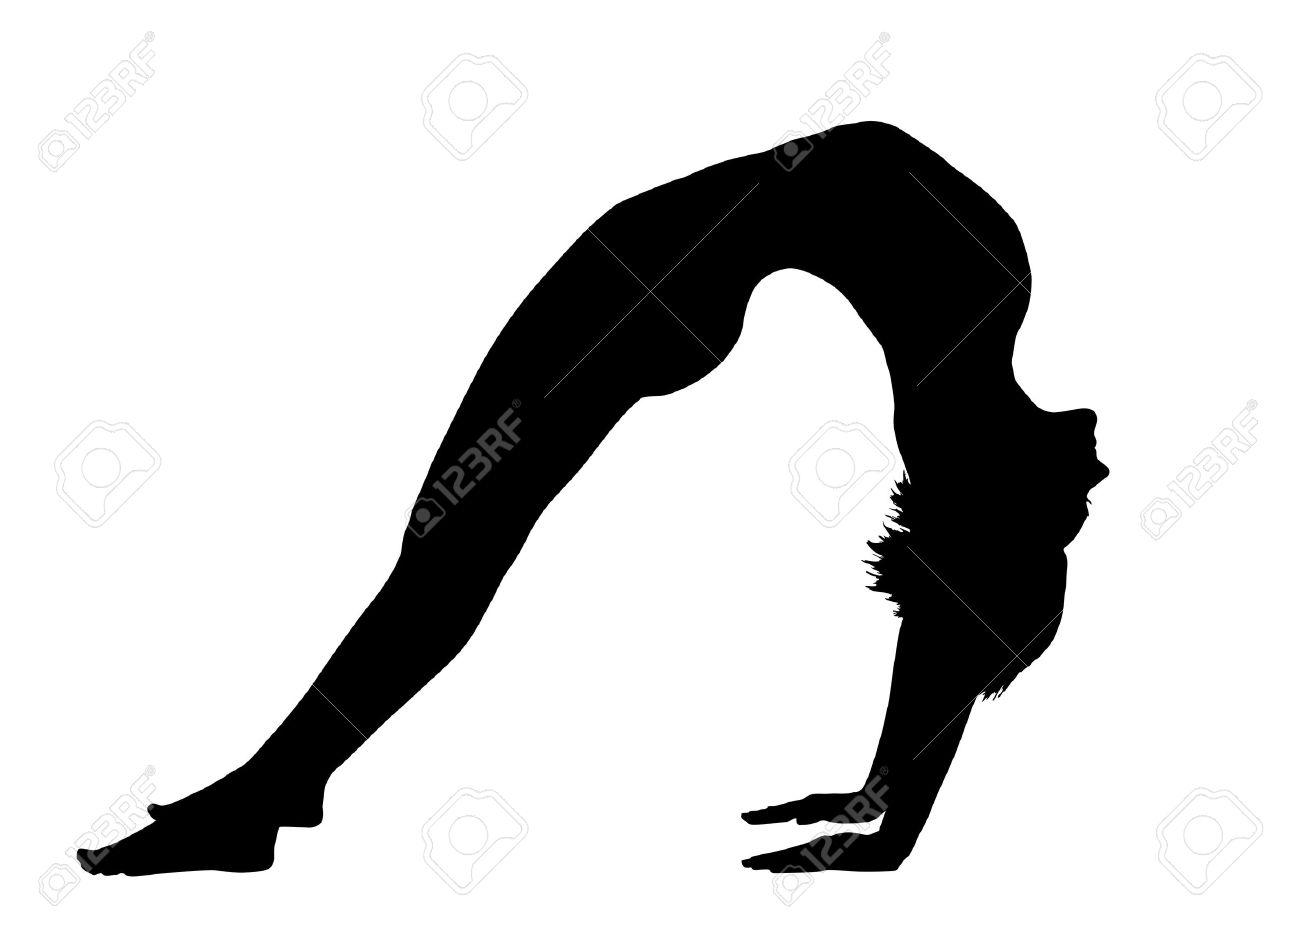 Bridge clipart gymnastics. Silhouette at getdrawings com